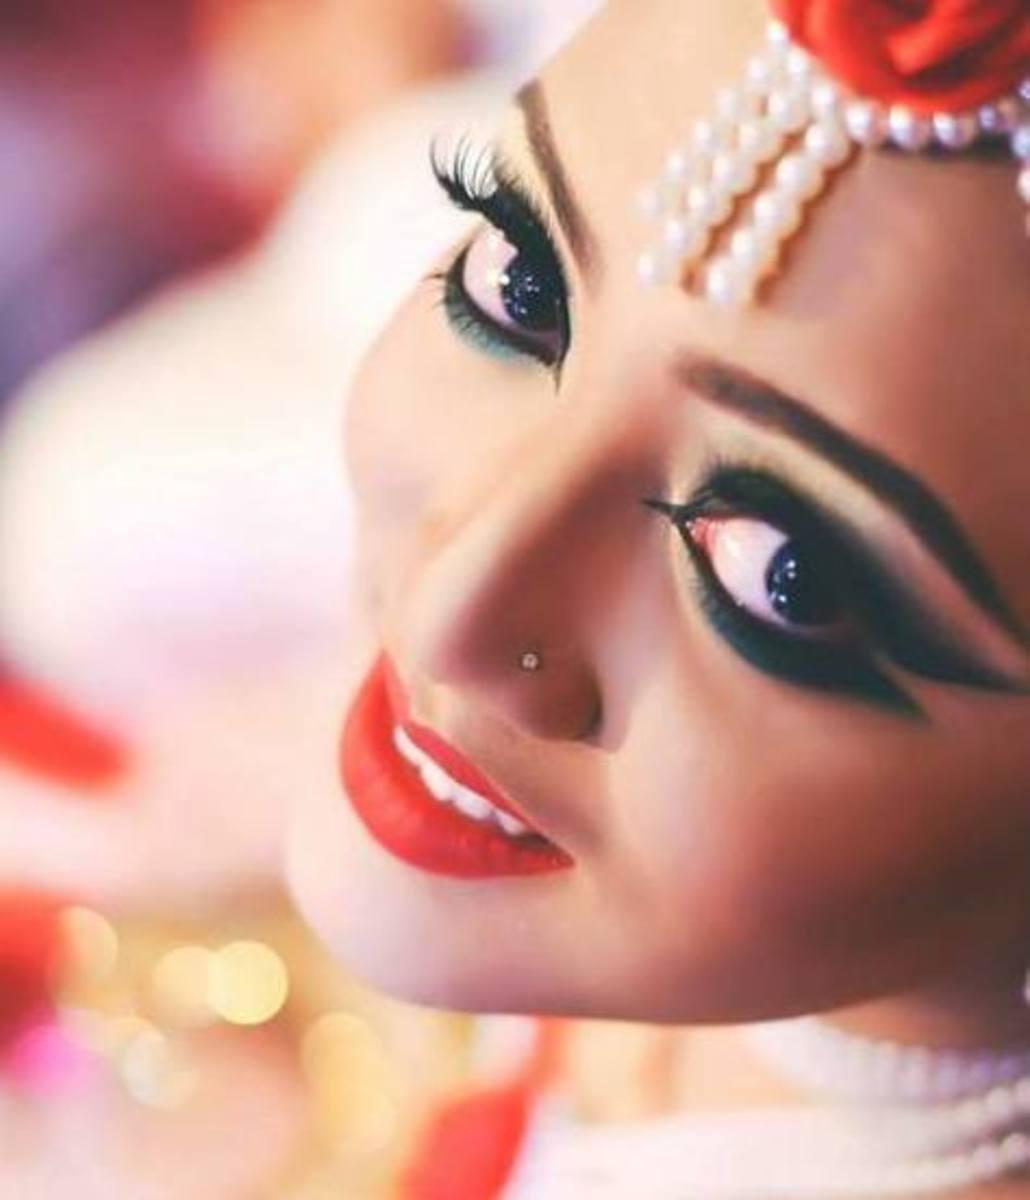 Zahid Khan's favourite bridal eye makeup with elongated winged eyeliner flicks.